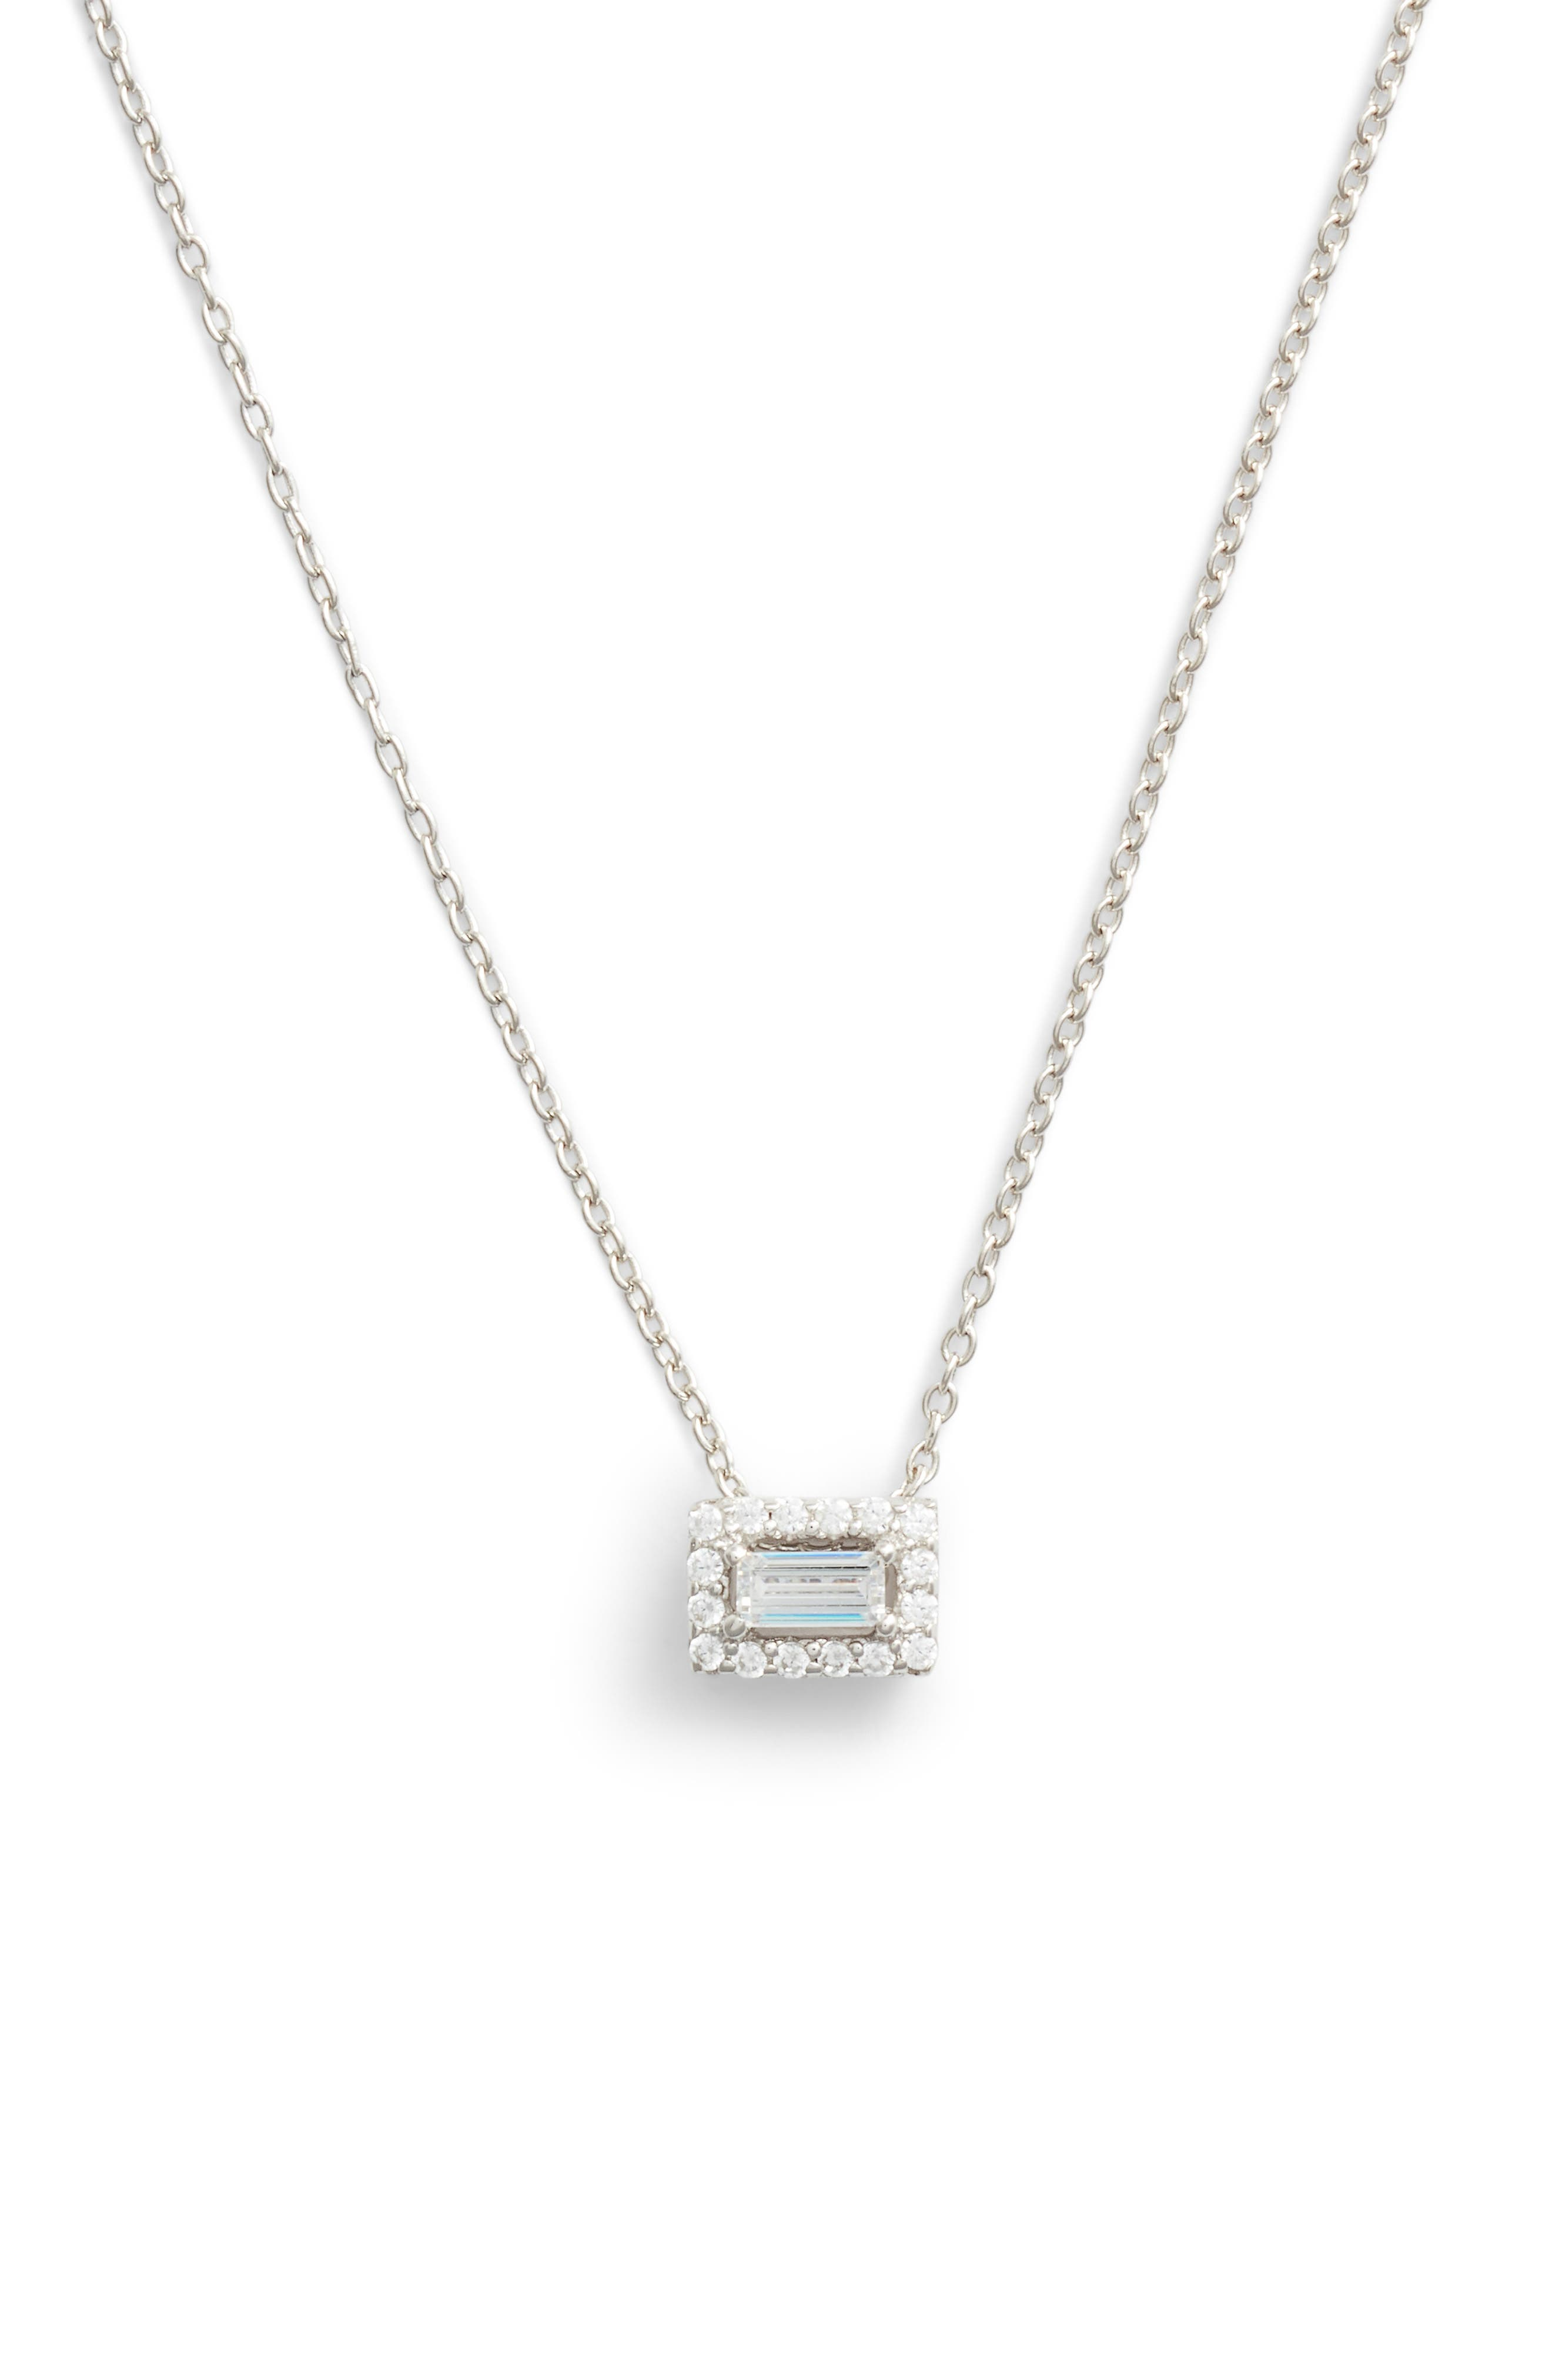 Baguette Halo Necklace,                         Main,                         color, SILVER/ CLEAR